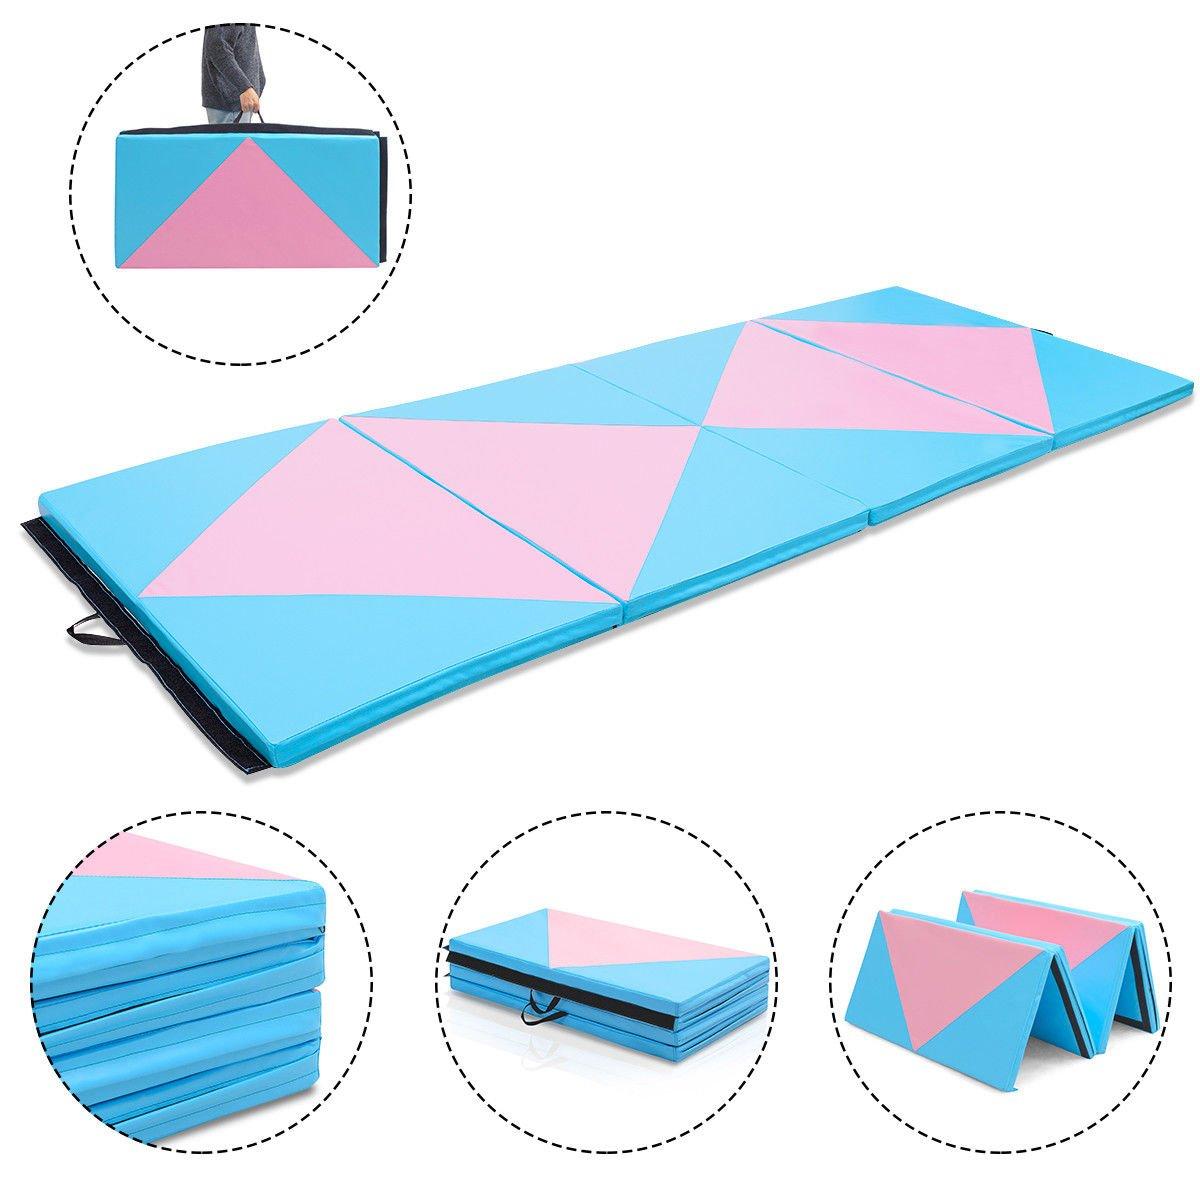 COSTWAY 4'X10'X2 Gymnastics Mat Folding Portable Aerobics Fitness Gym Exercise, Pink/Blue by COSTWAY